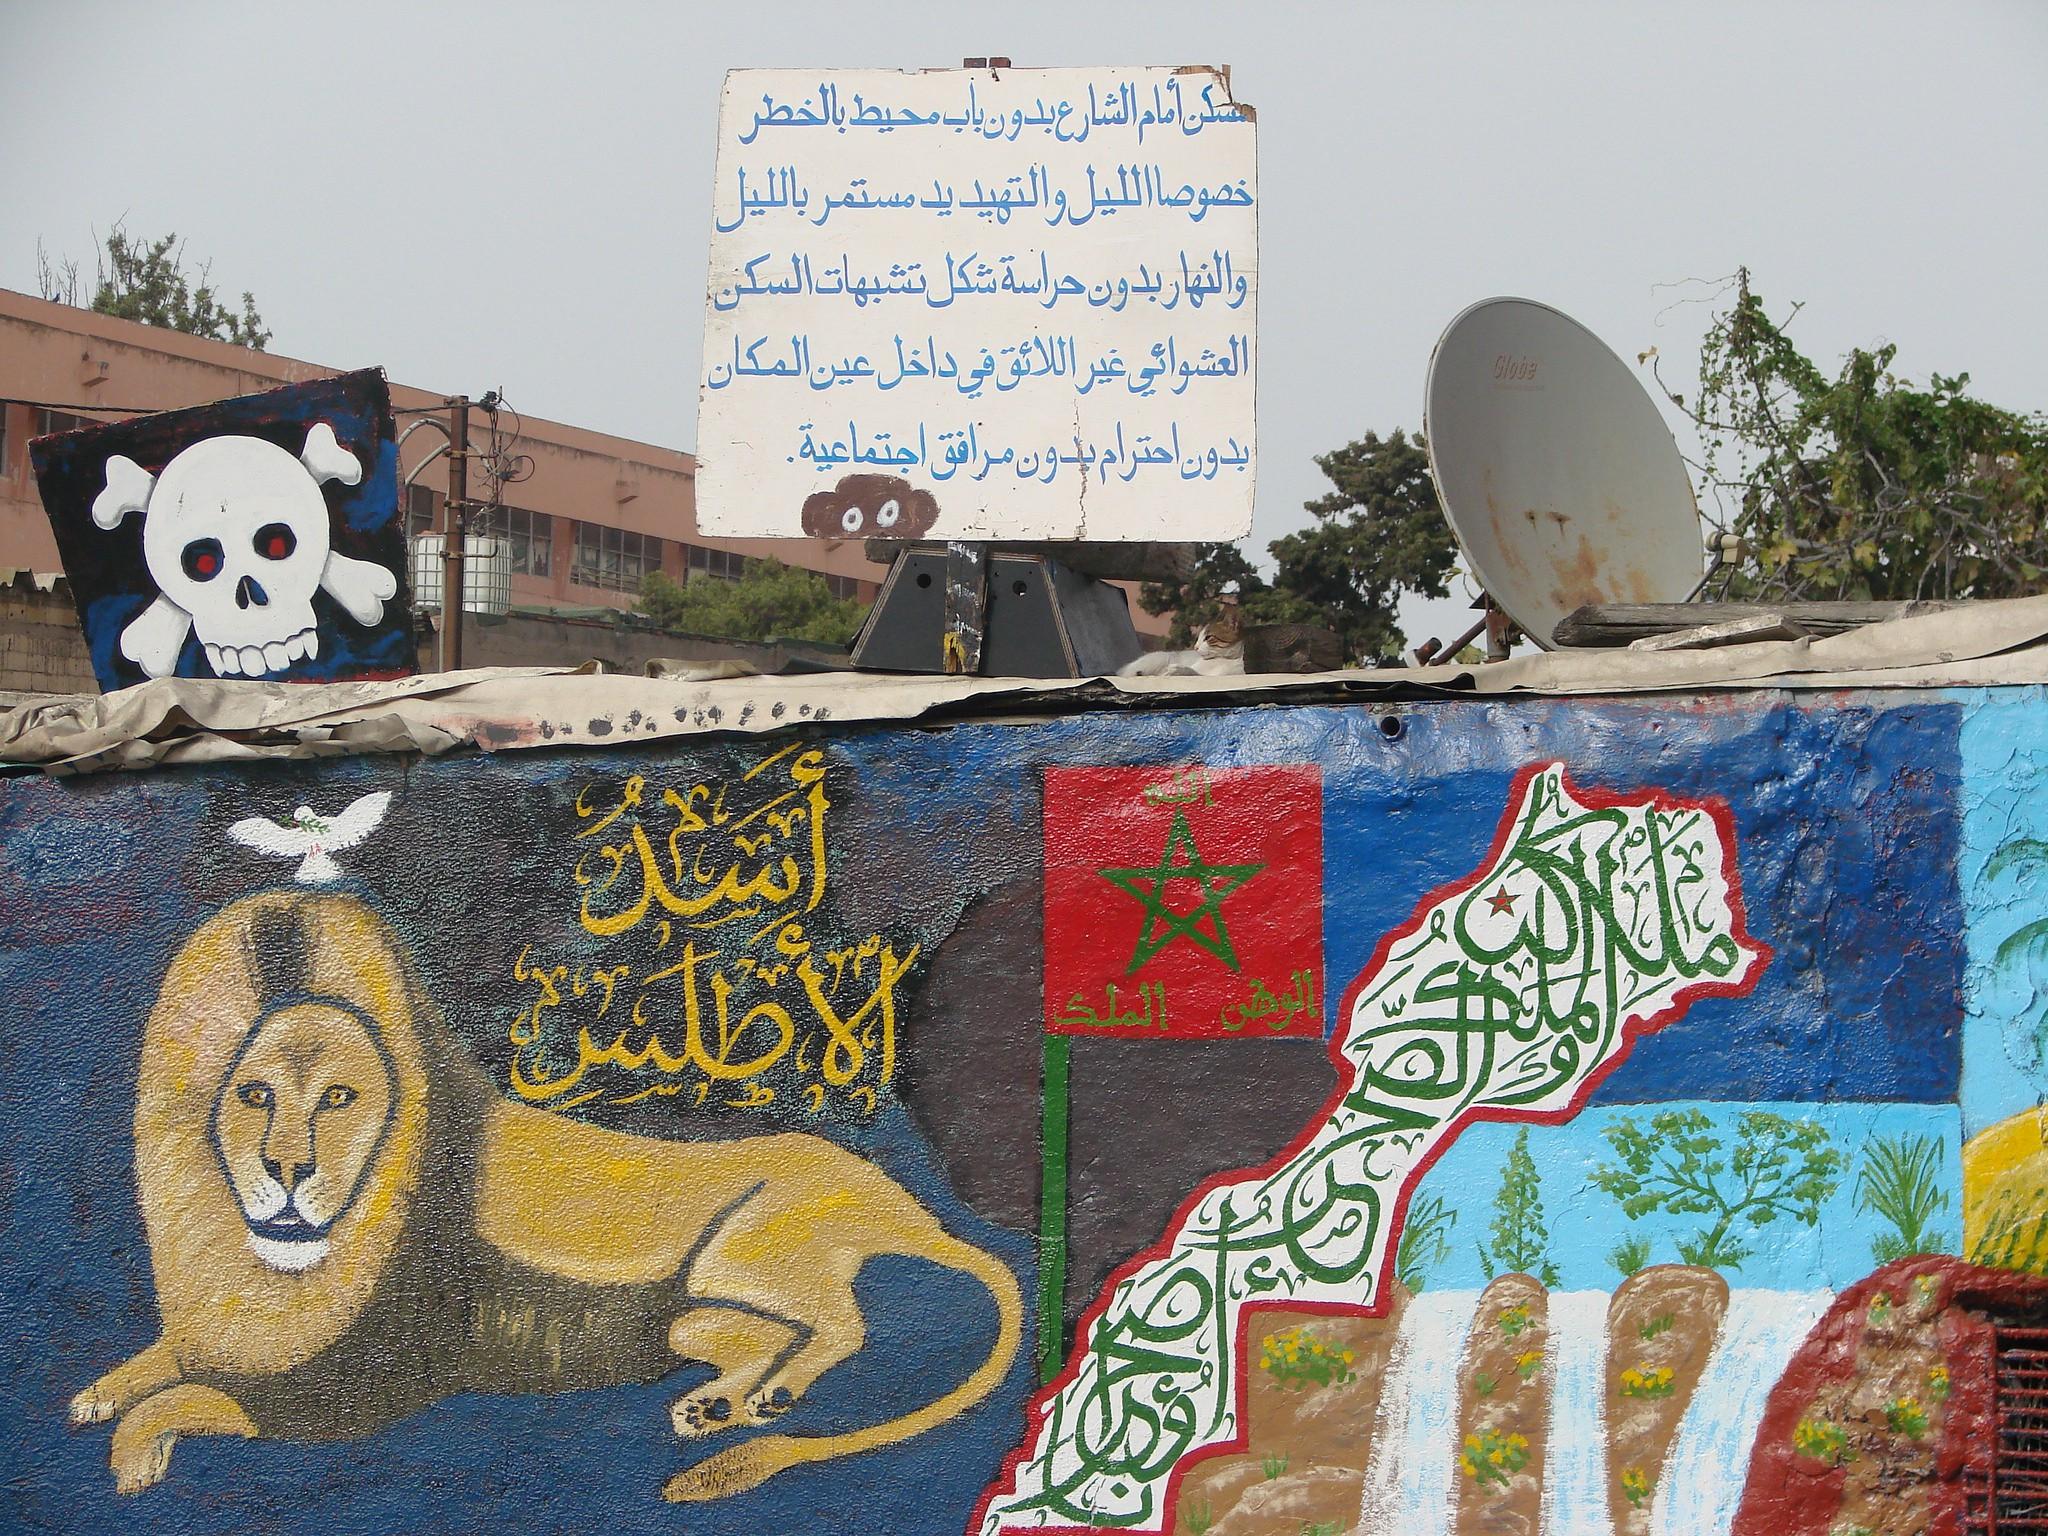 Eye-catching artwork on a wall in Casablanca | © otoniel costa neto / Flickr